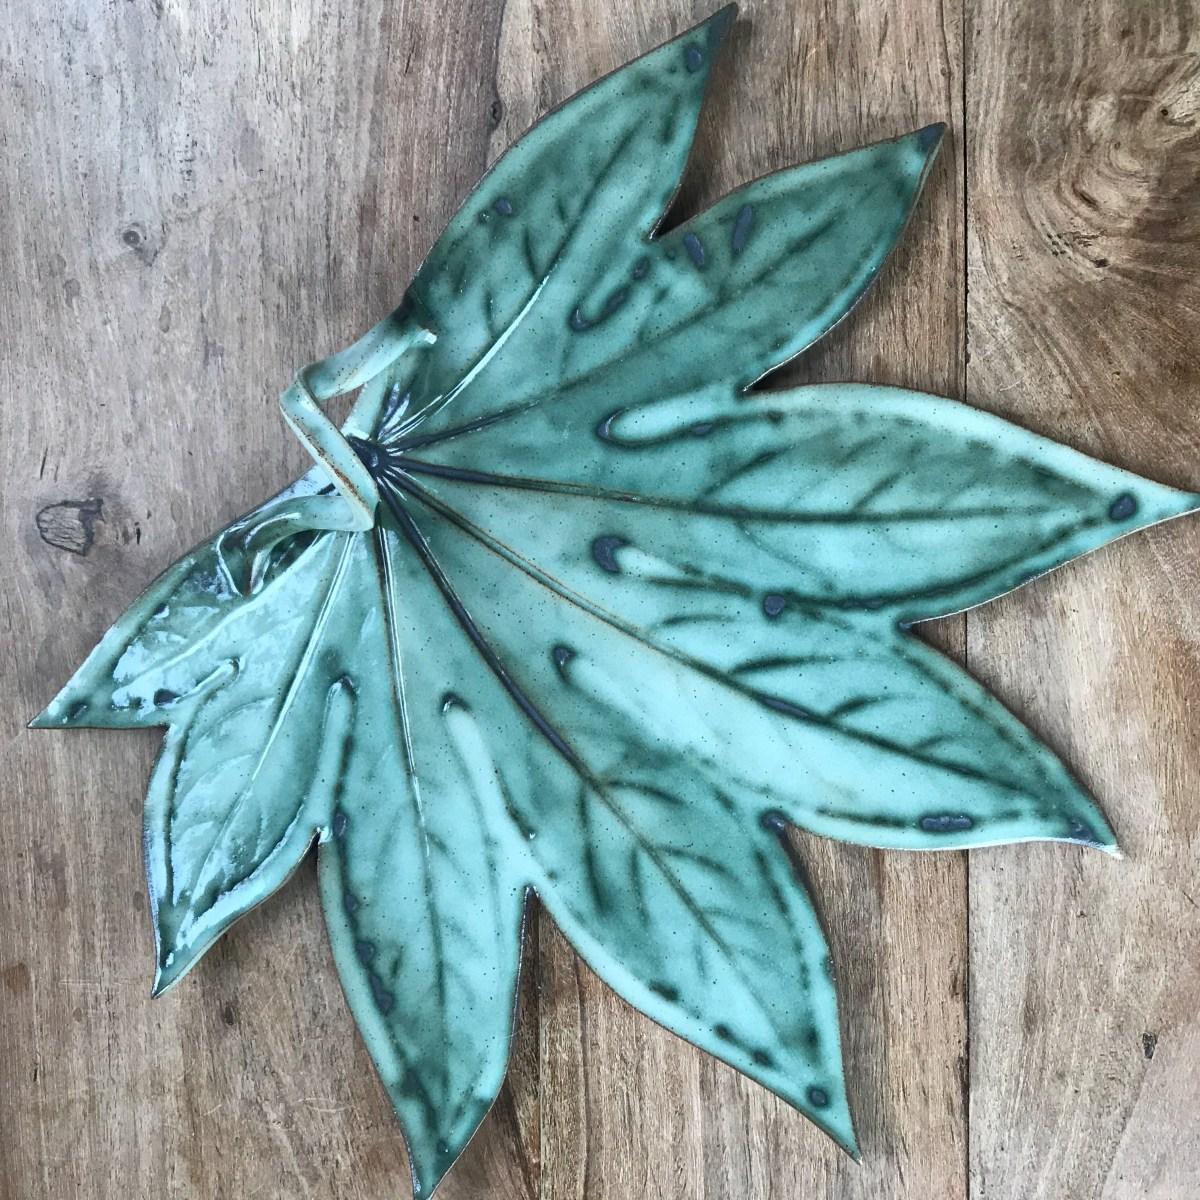 Fatsia Leaf Sharing Platter by Sonya Ceramic Art - Ceramics Inspired by Nature